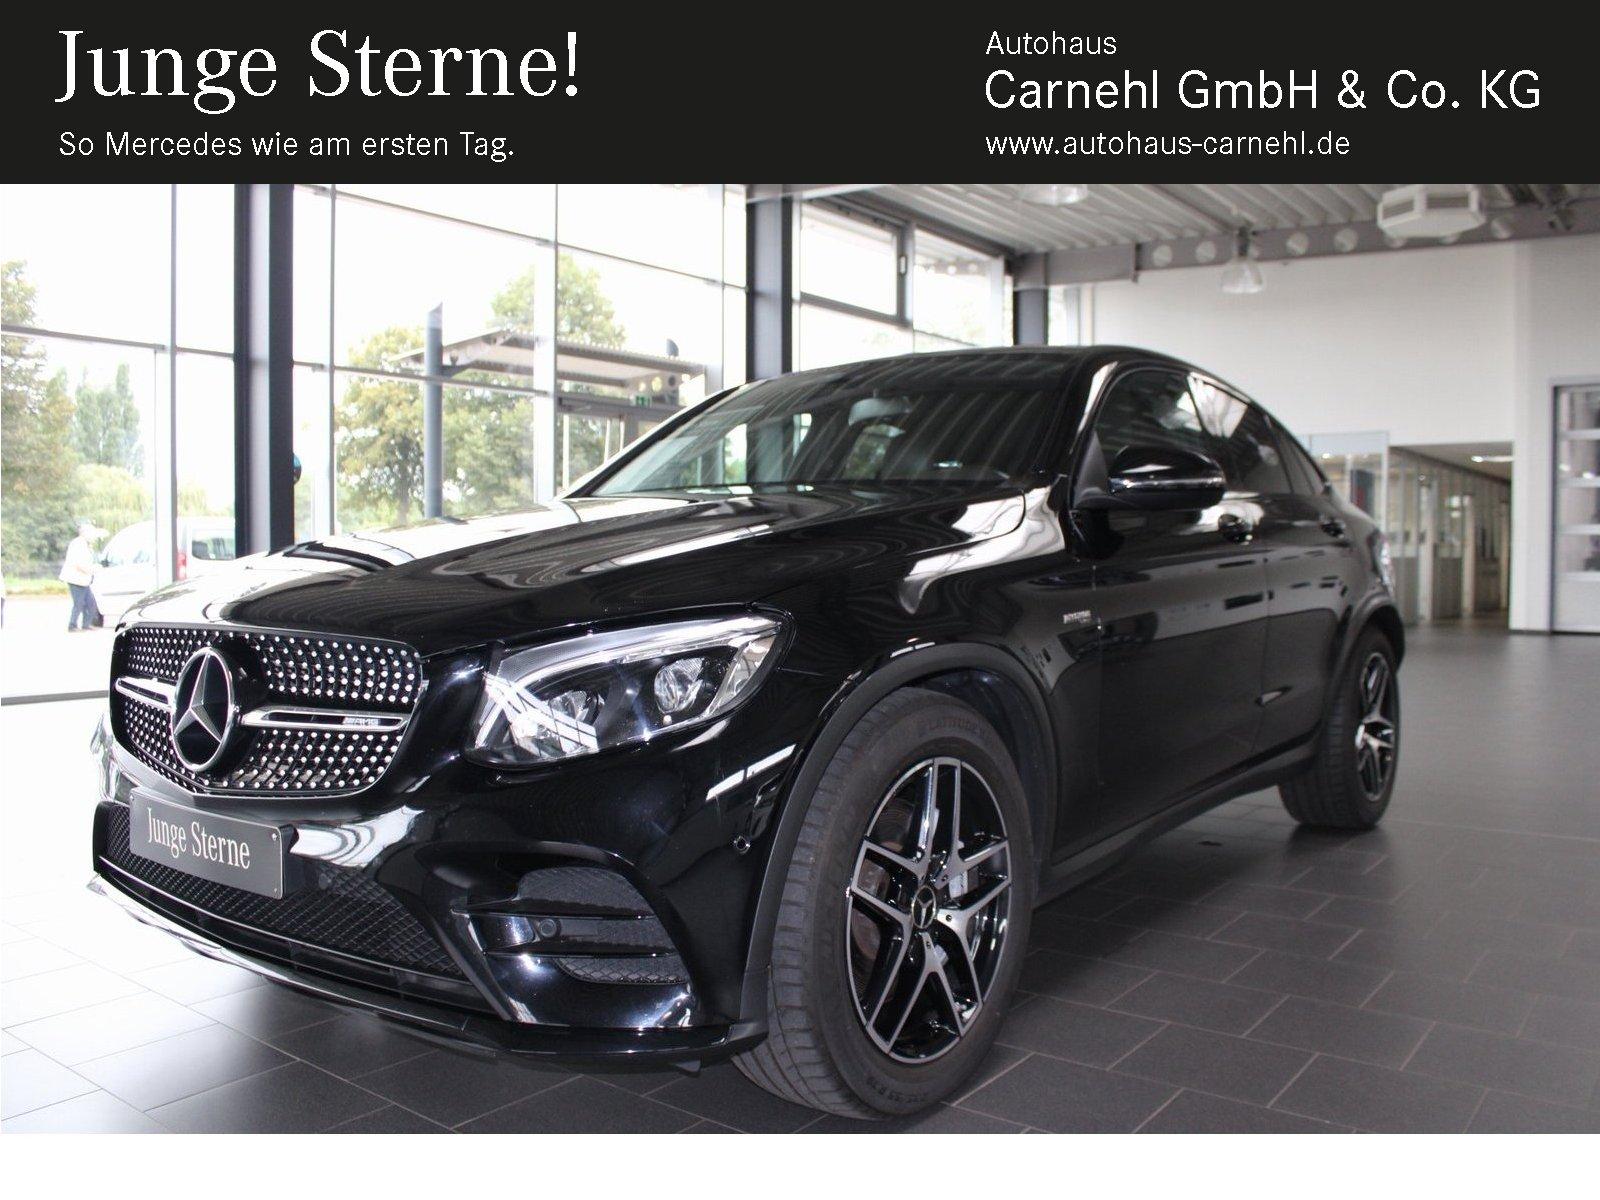 Mercedes-Benz GLC 43 AMG 4M Coupe+Night+Airmatic+SHD+Ambiente, Jahr 2018, Benzin